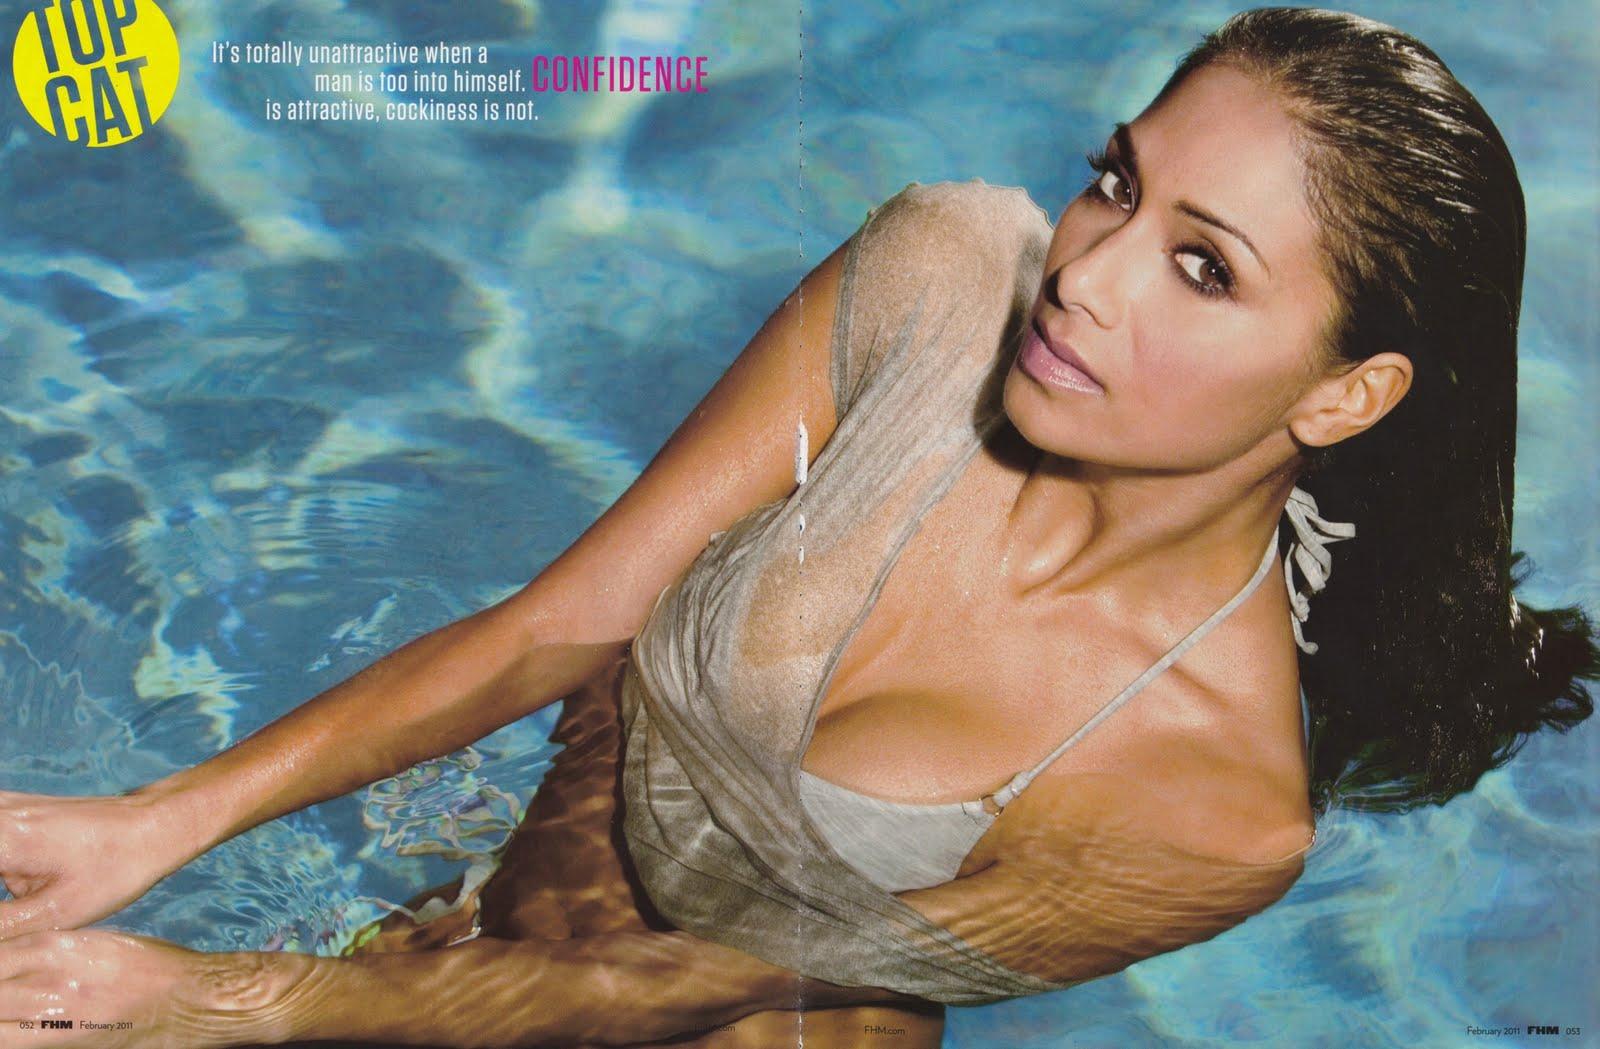 http://3.bp.blogspot.com/-OJWz592hF2M/Trjyt4hZgSI/AAAAAAAAR4U/xh4T04h2xLQ/s1600/Nicole-Scherzinger-FHM-photoshoot.jpg